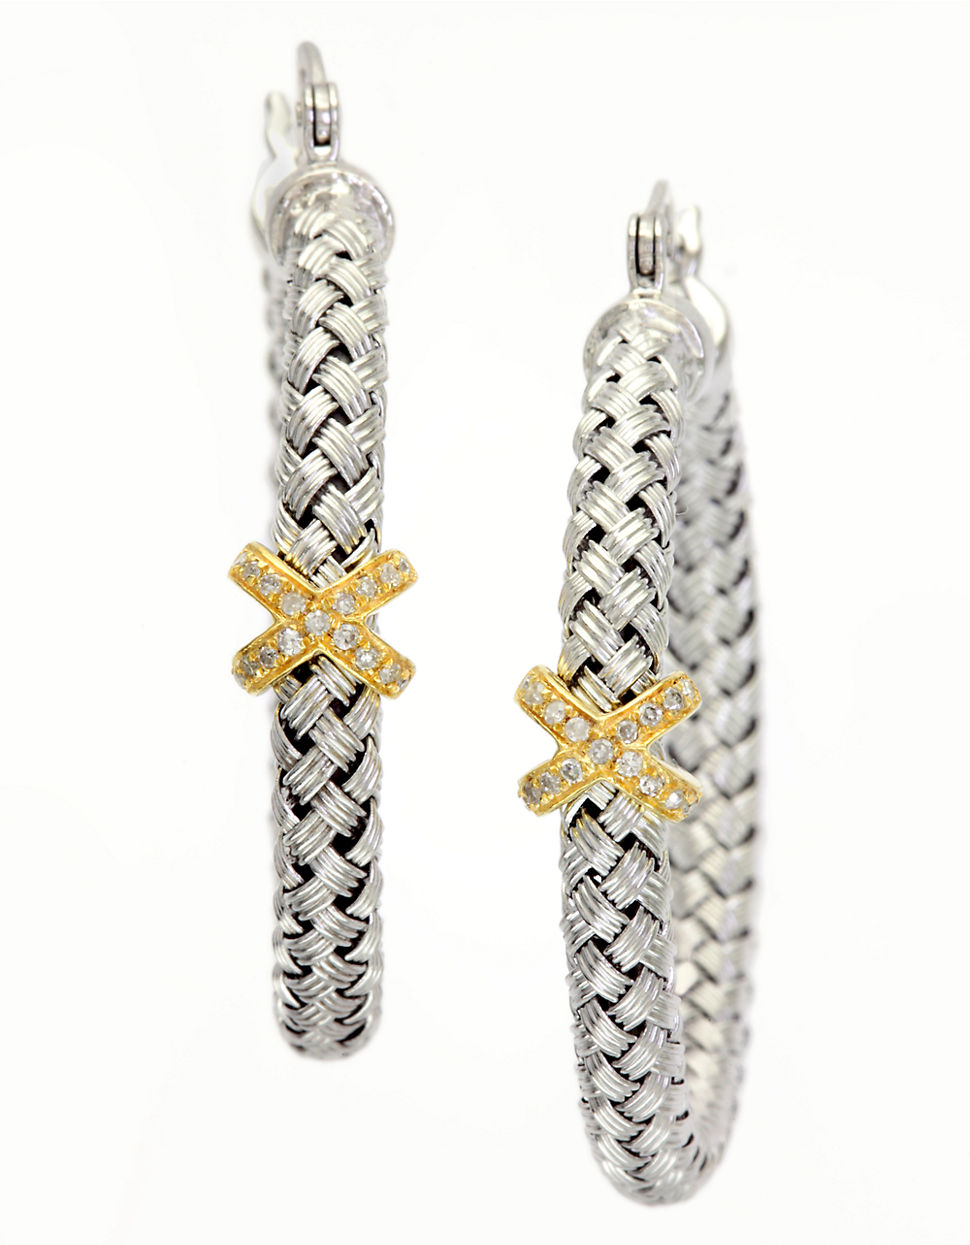 Effy Balissima Sterling Silver Hoop Earrings With 14Kt